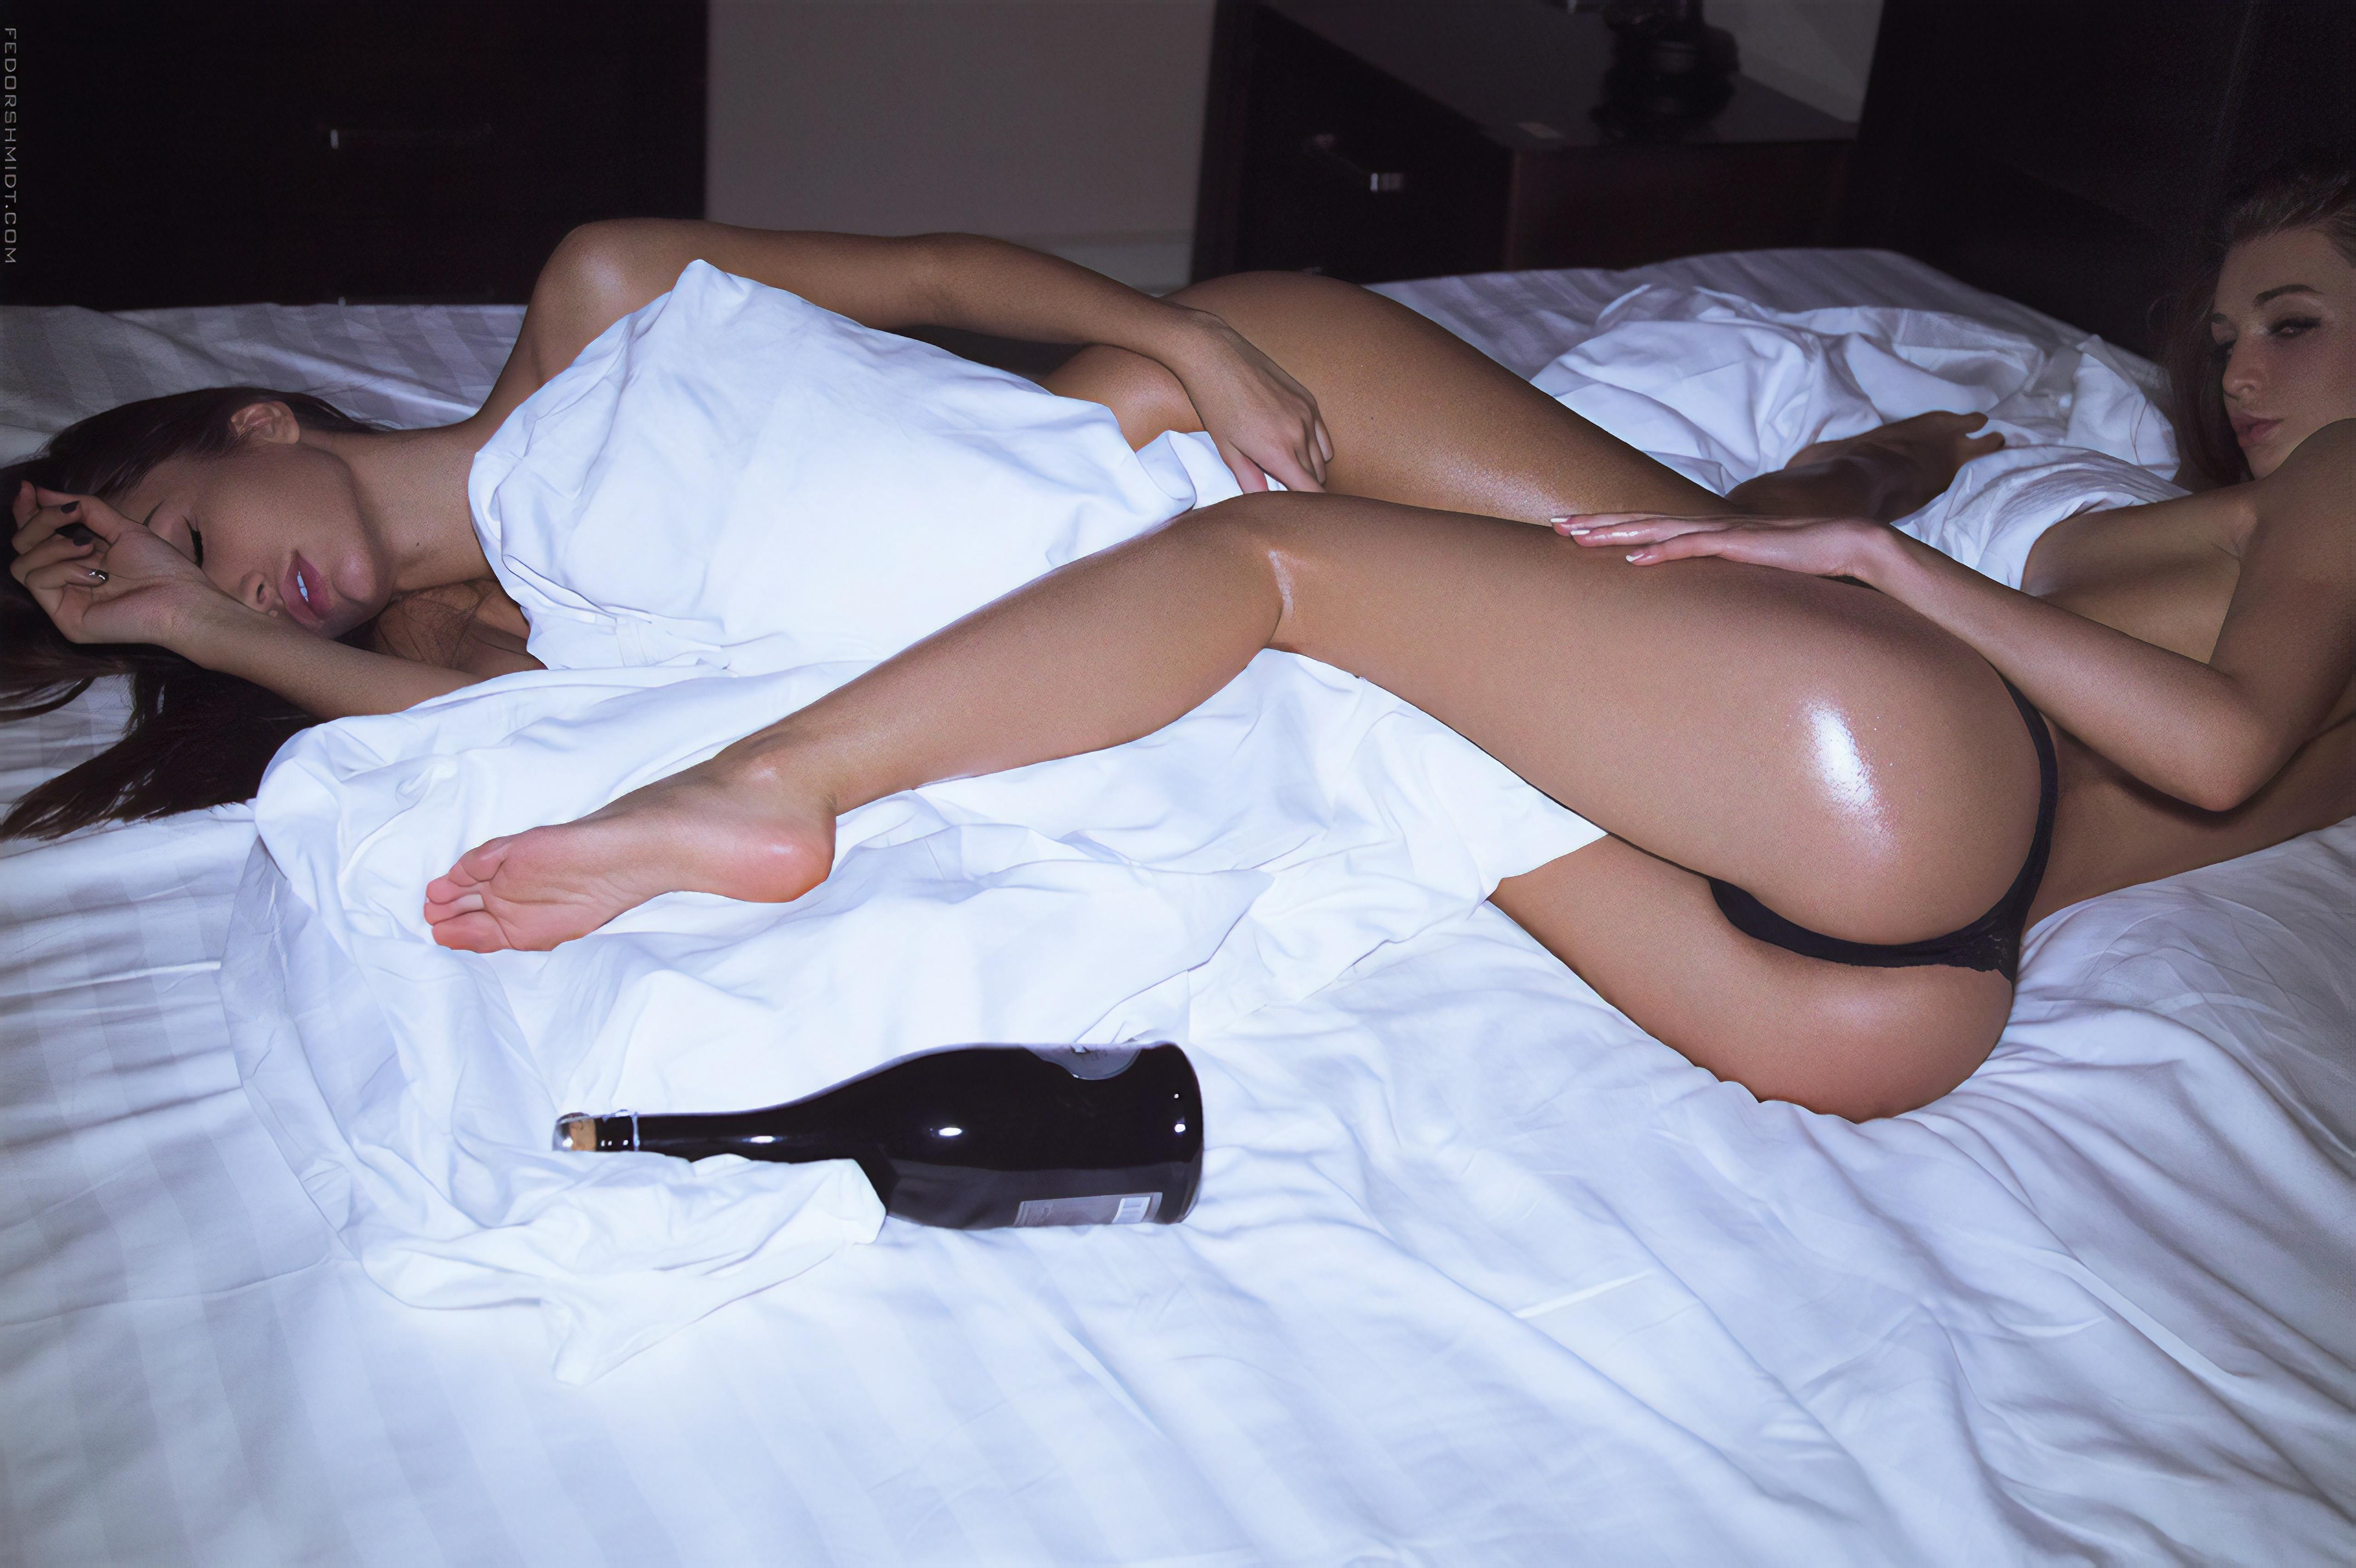 White nudes by maciek kobielski lq photo shoot,Muscle and fitness Adult images Josephine skriver jasmine tookes victorias secret photoshoot in venice beach ca,Lindsey Pelas Selfies - 2 Pics Gif